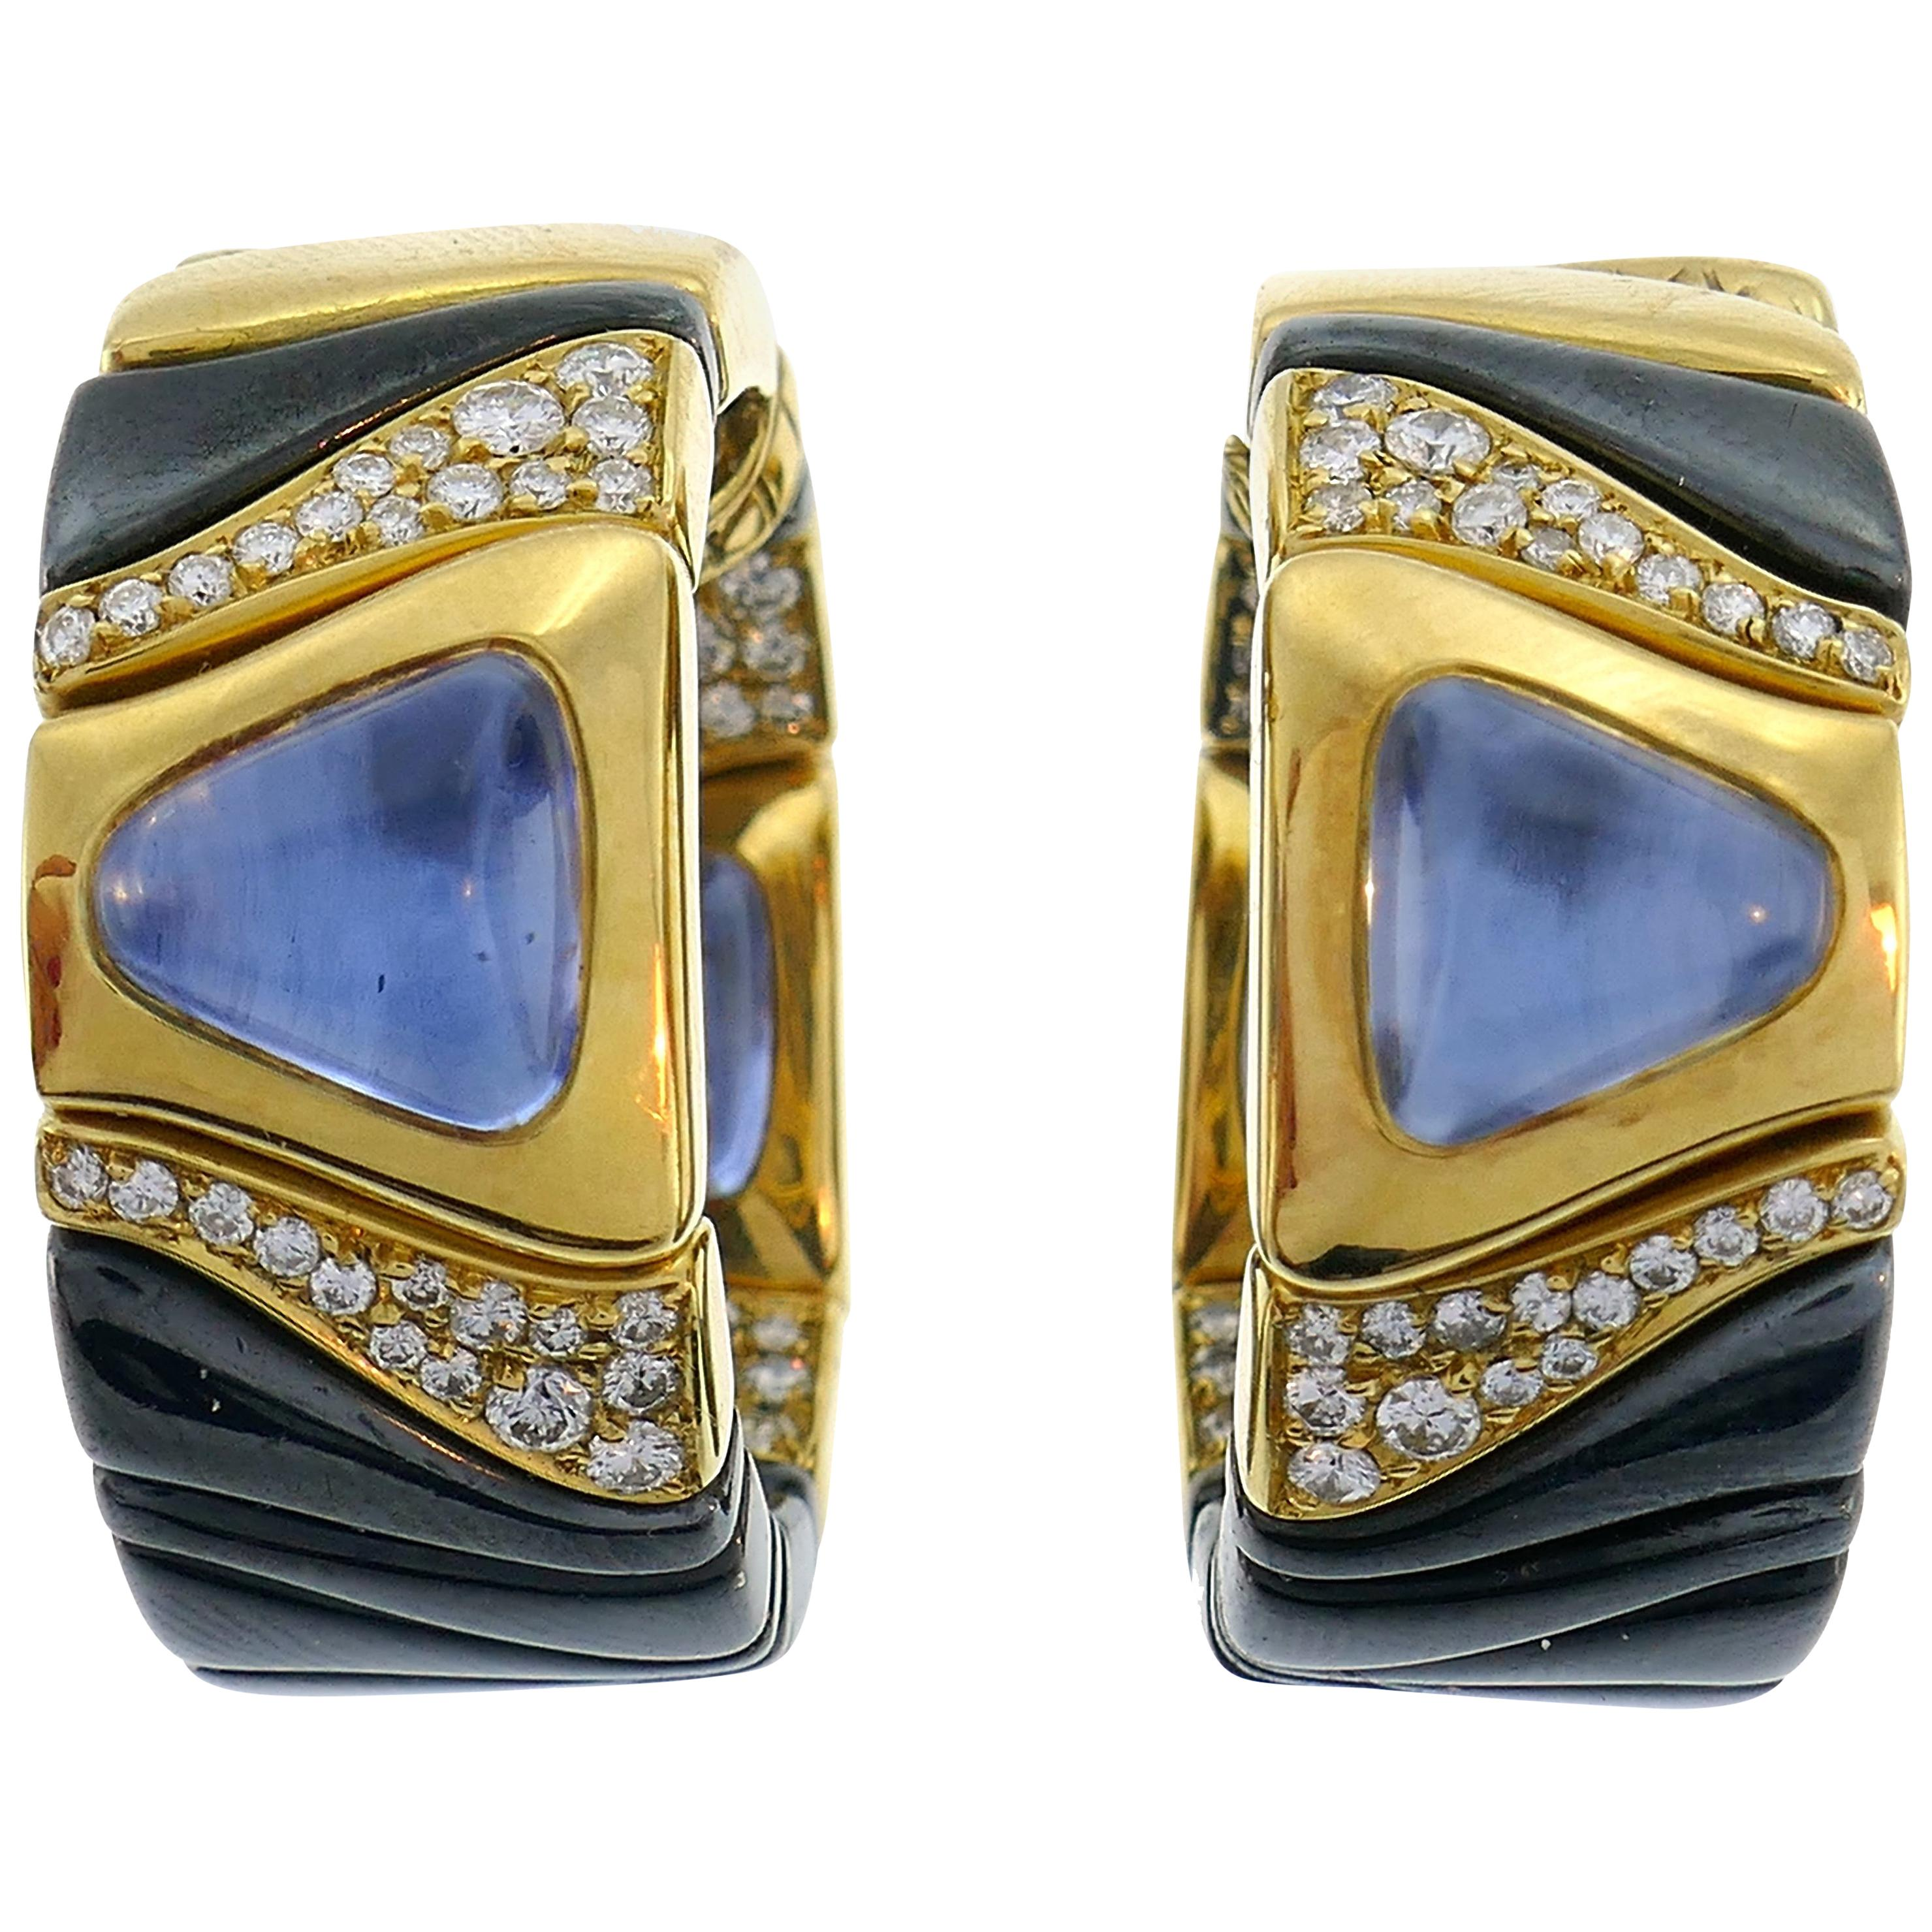 Marina B Enamel Yellow Gold Hoop Earrings with Blue Sapphire Diamond, 1987